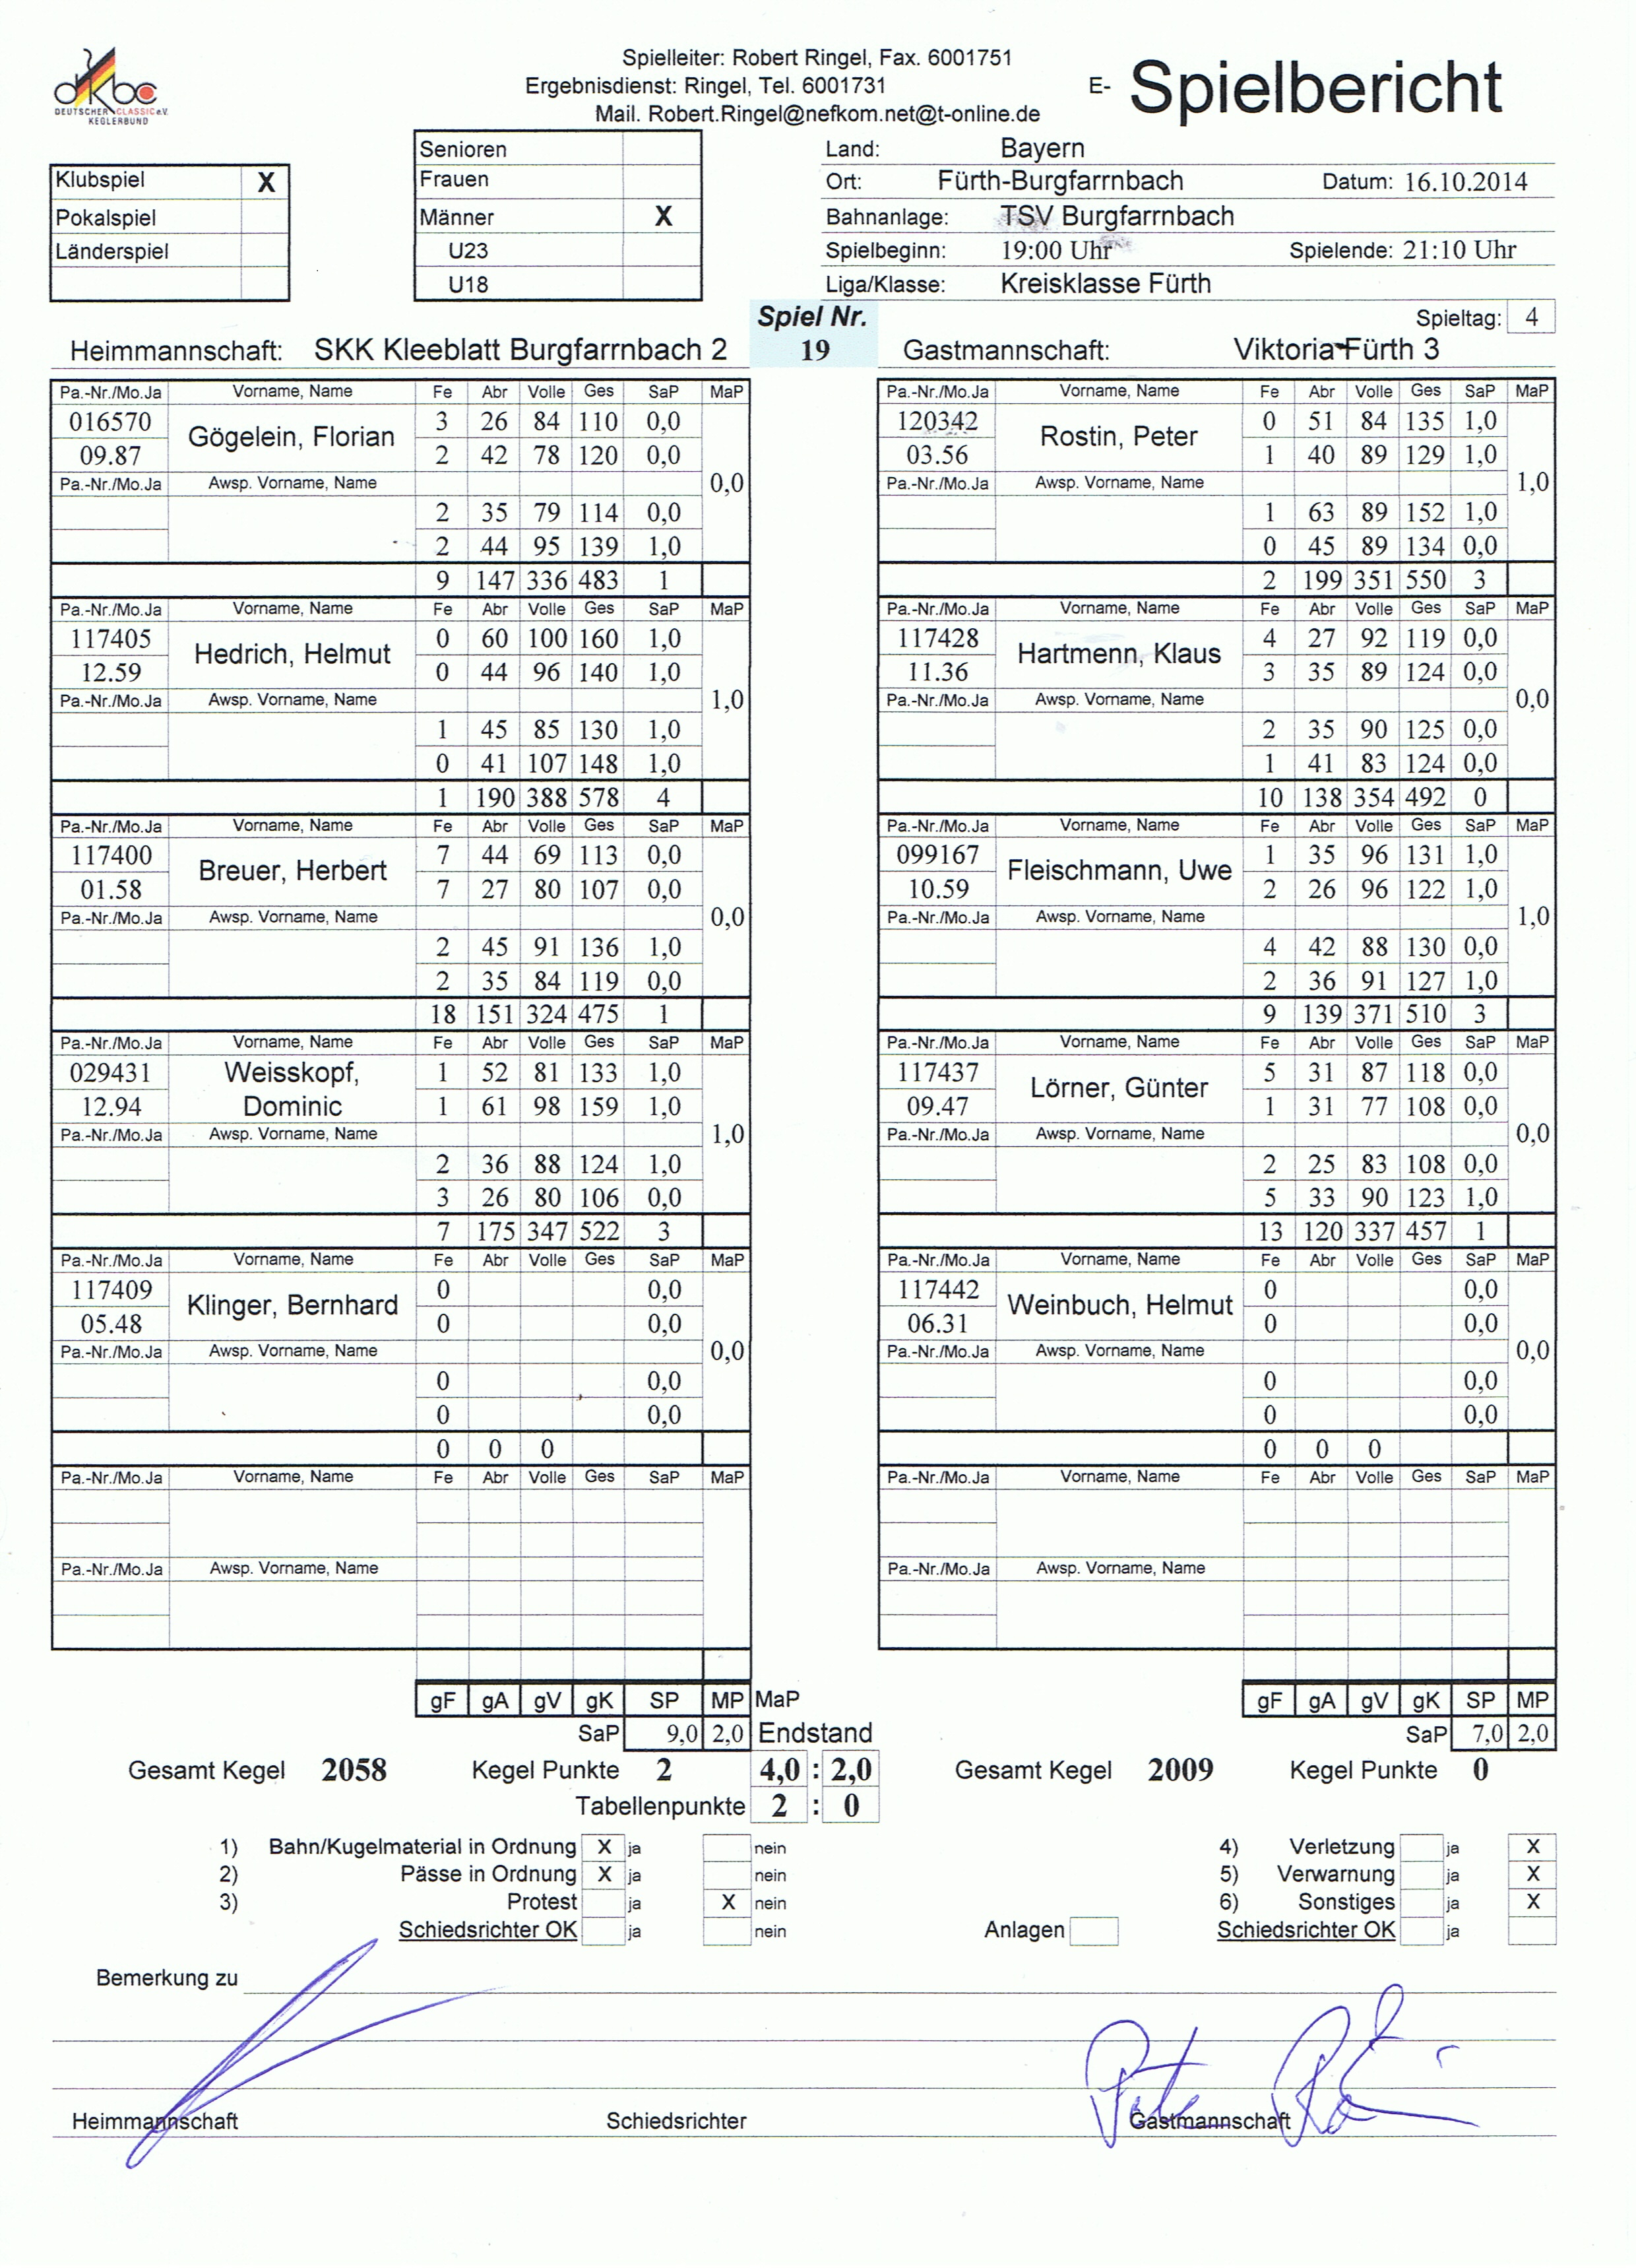 Burgfarrnbach2-V3